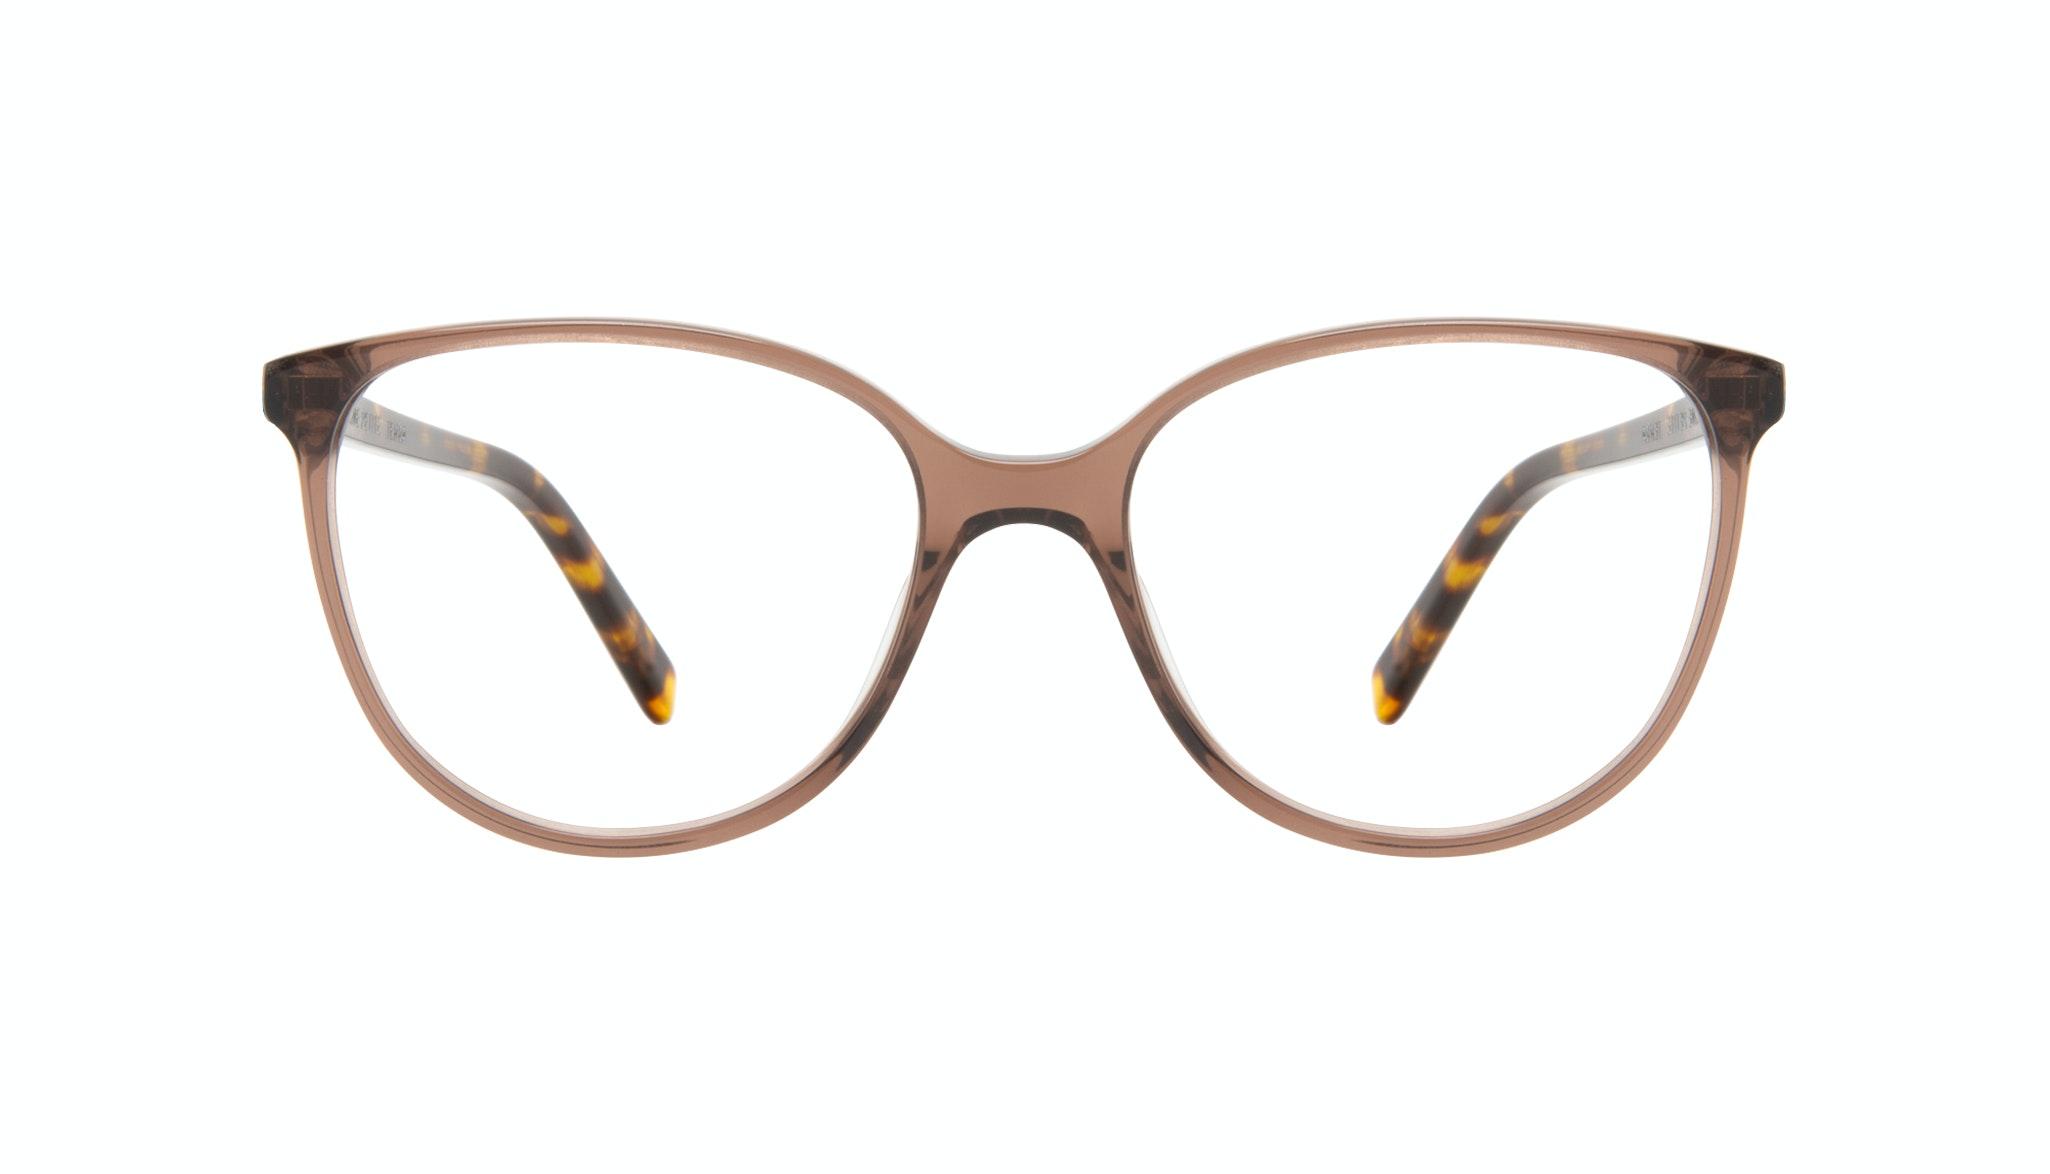 Affordable Fashion Glasses Round Eyeglasses Women Imagine Petite Terra Front